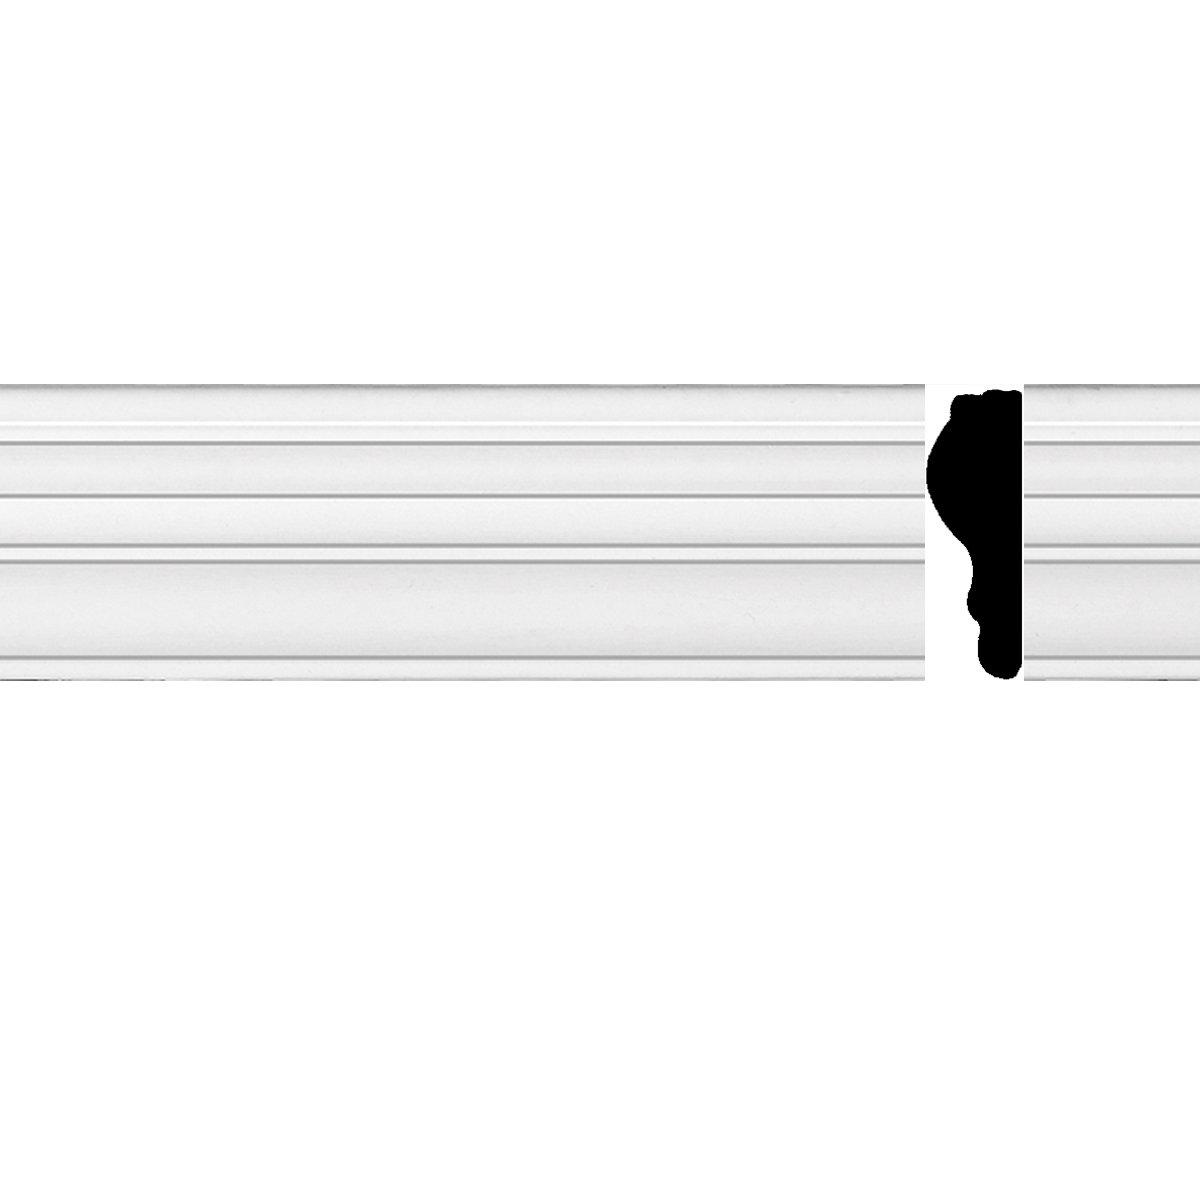 "Chair Rail White Urethane Molding 97"" X 1 3/4"" | Renovator's Supply"